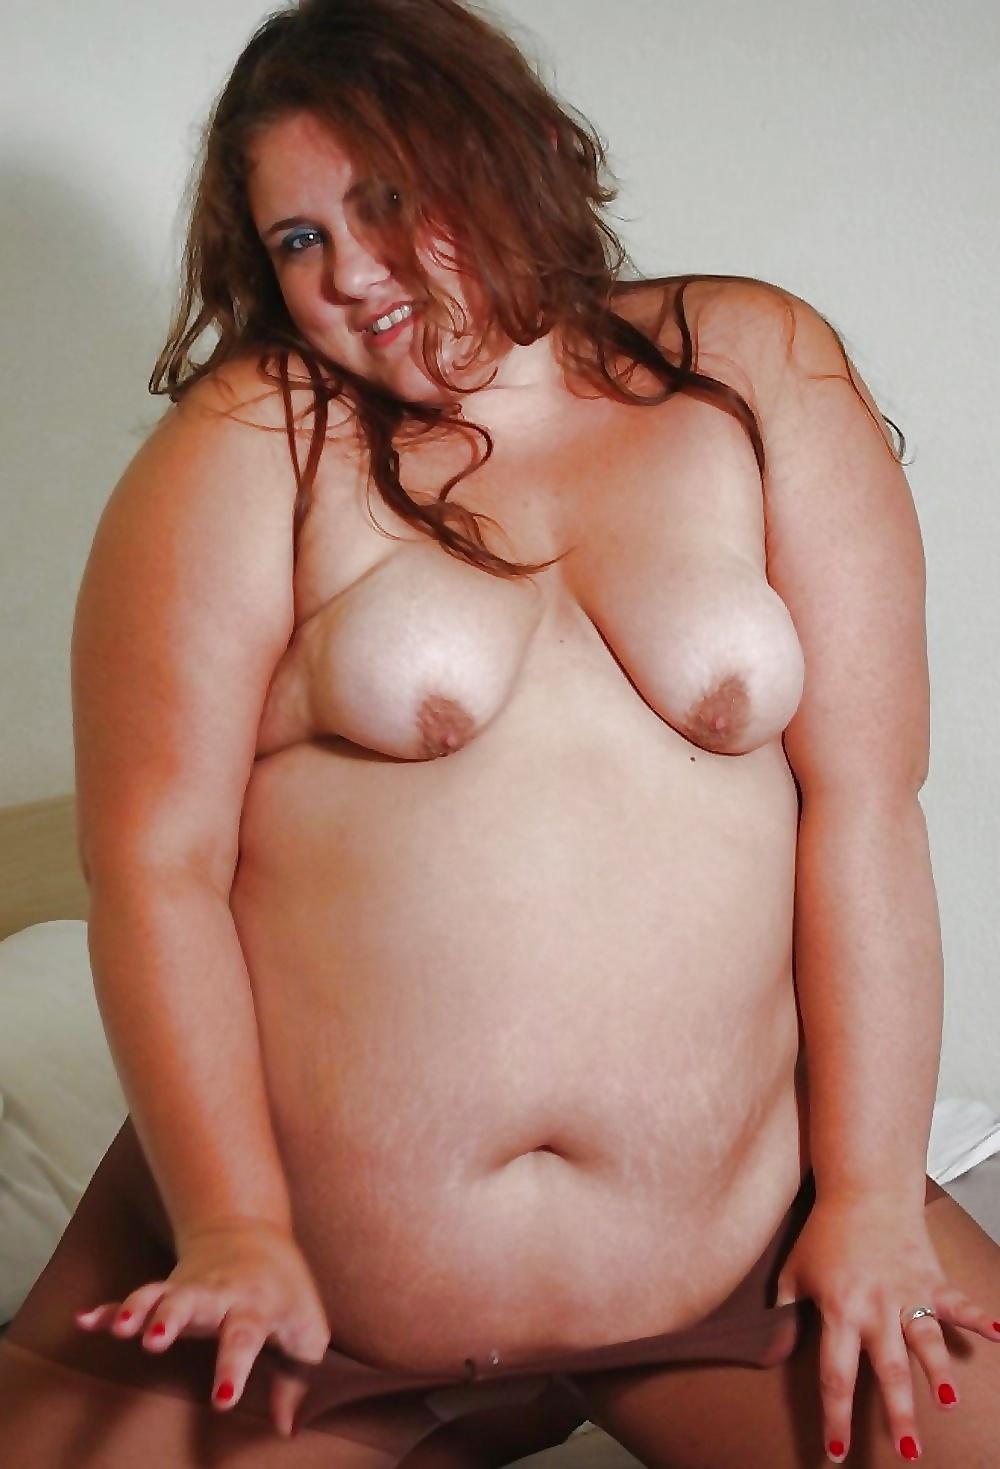 Sex short girl fat pic nude slip cheerleaders redhead